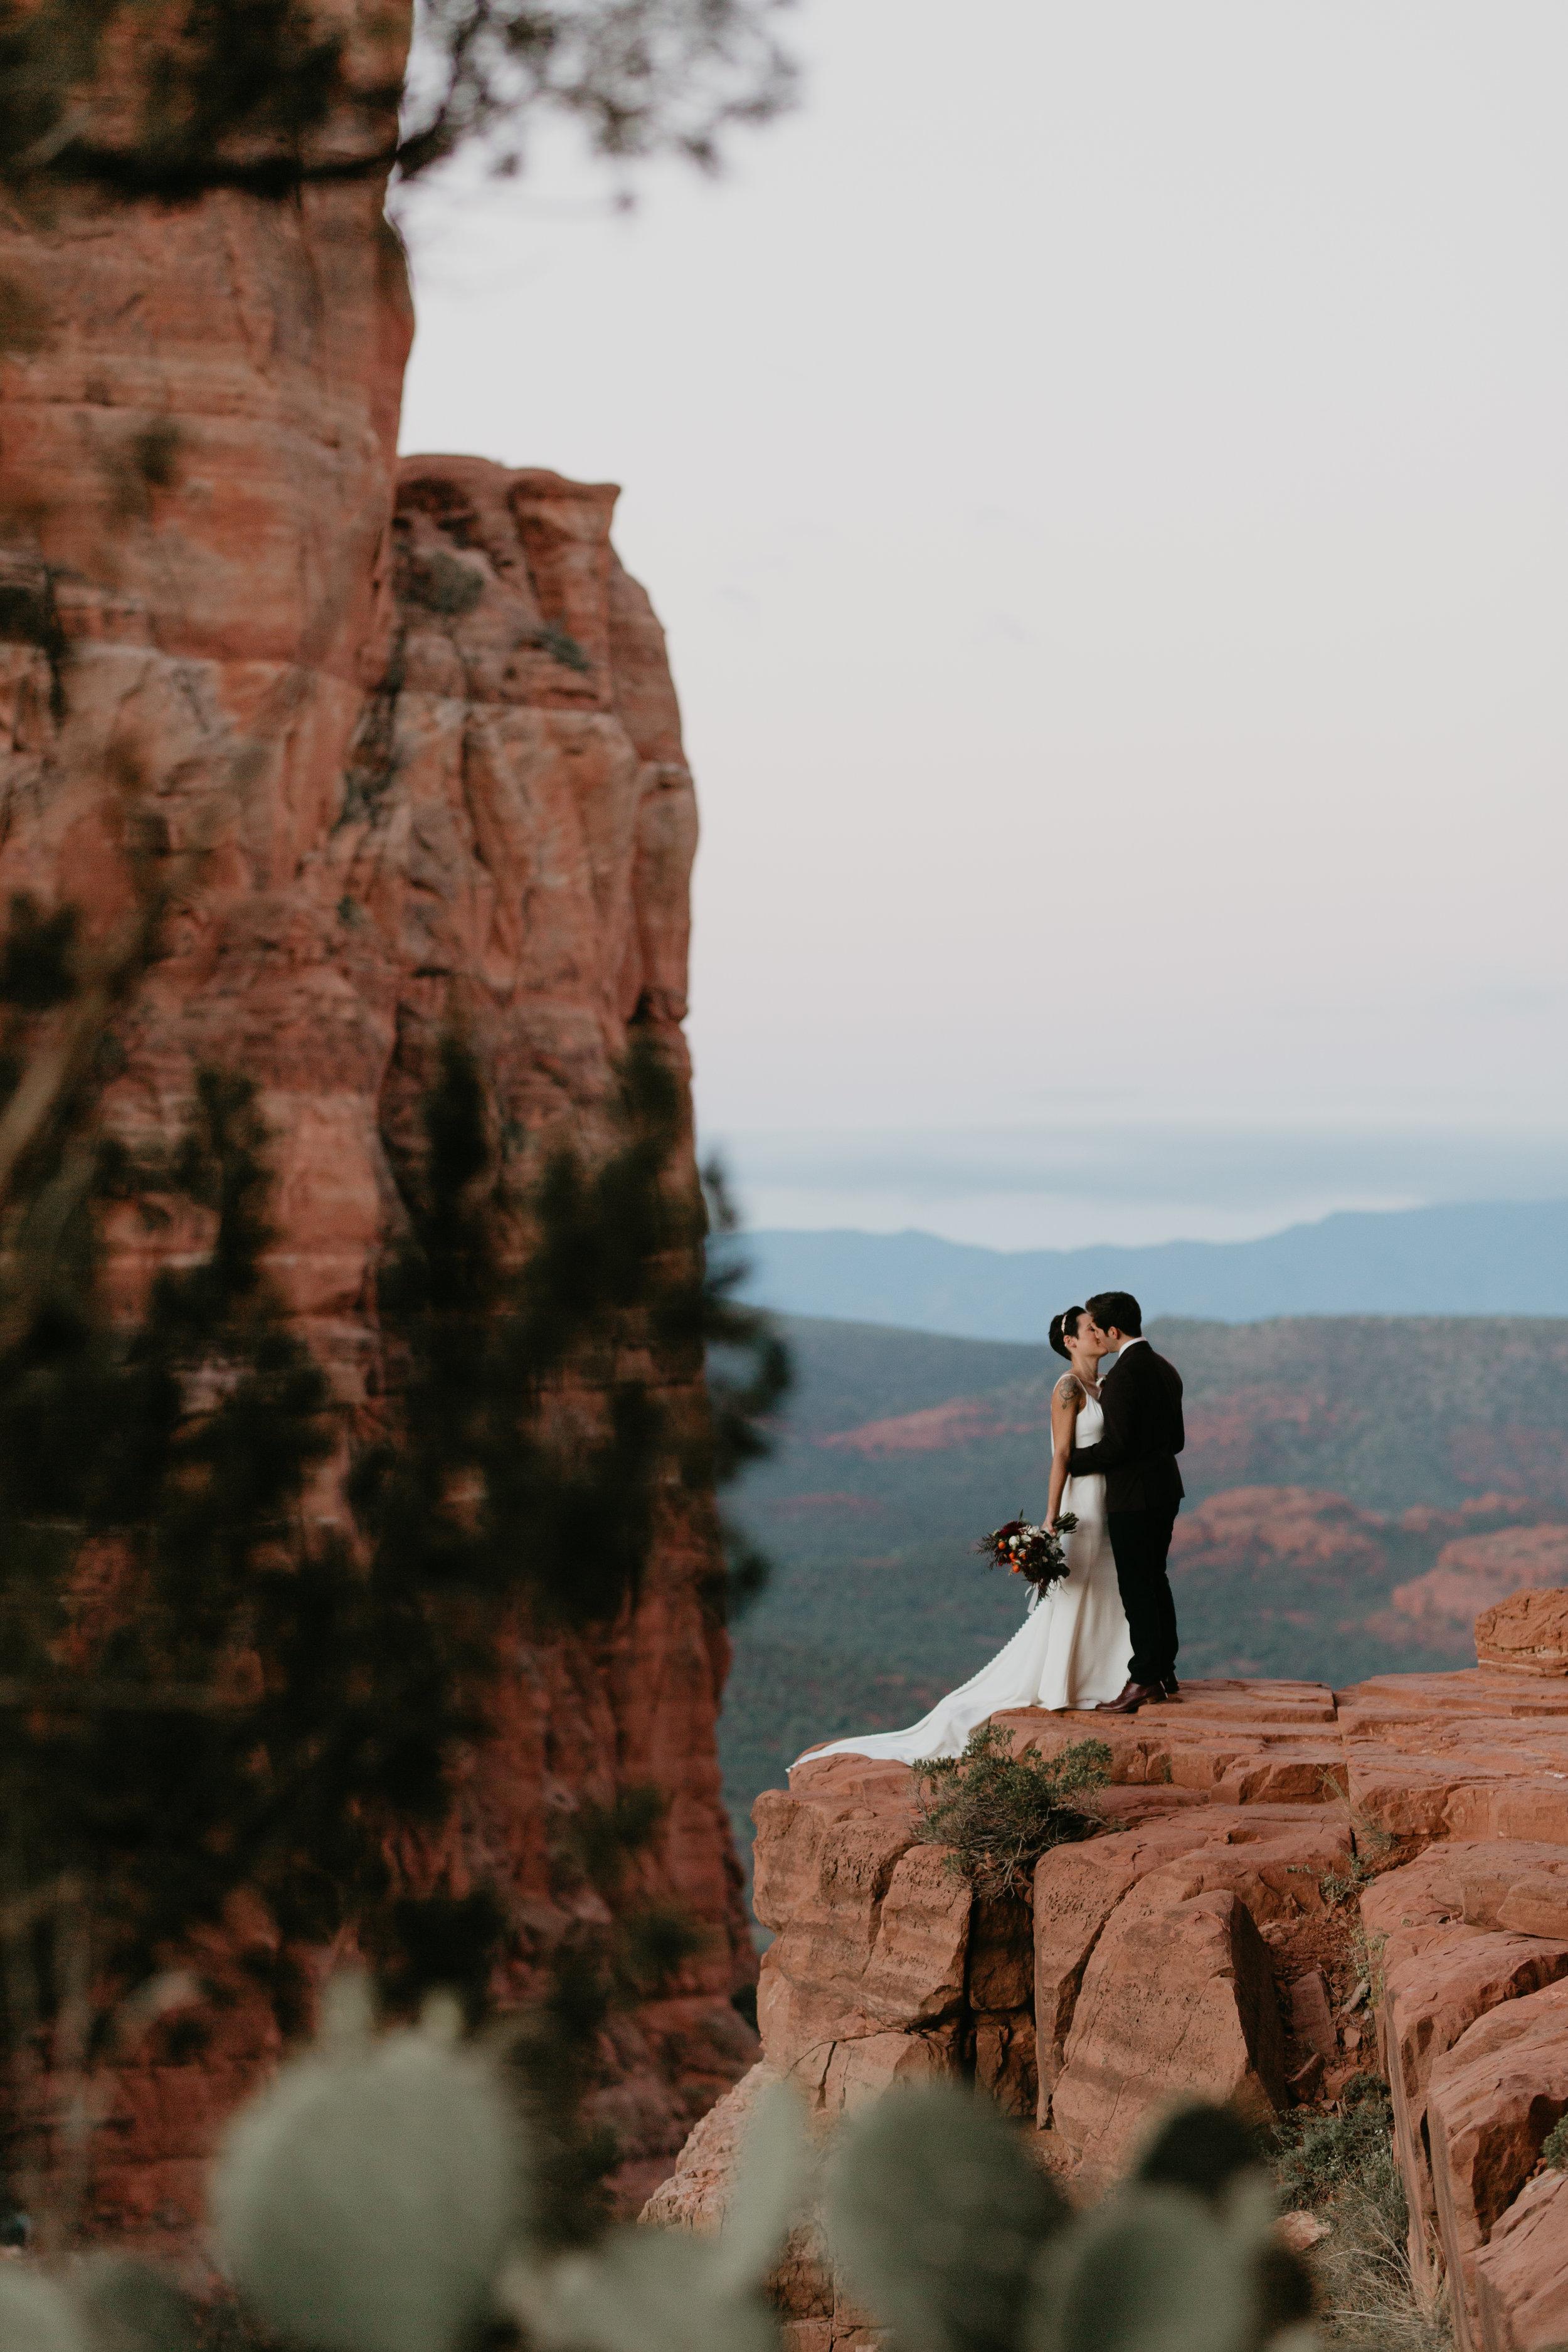 nicole-daacke-photography-sedona-arizona-destination-elopement-wedding-photographer-catherdral-rock-hiking-elopement-sedona-river-elopement-photos-desert-rock-wedding-photographer-laid-back-spontaneous-elopement-14.jpg